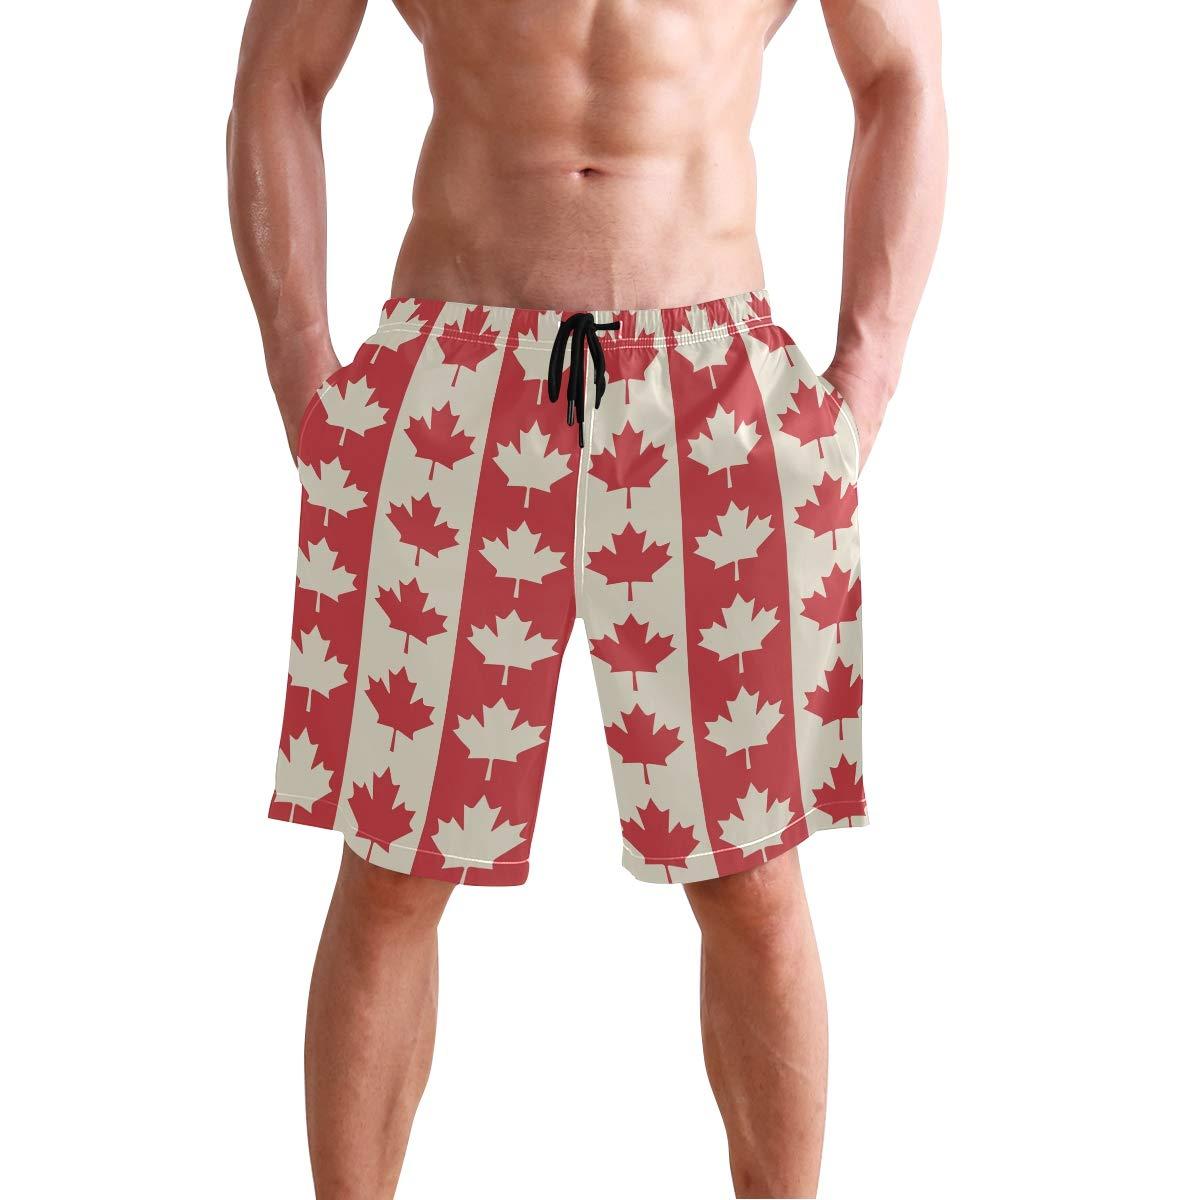 Canadian Flag Mens Trunks Beach Board Shorts Drawstring Waist Mesh Lining